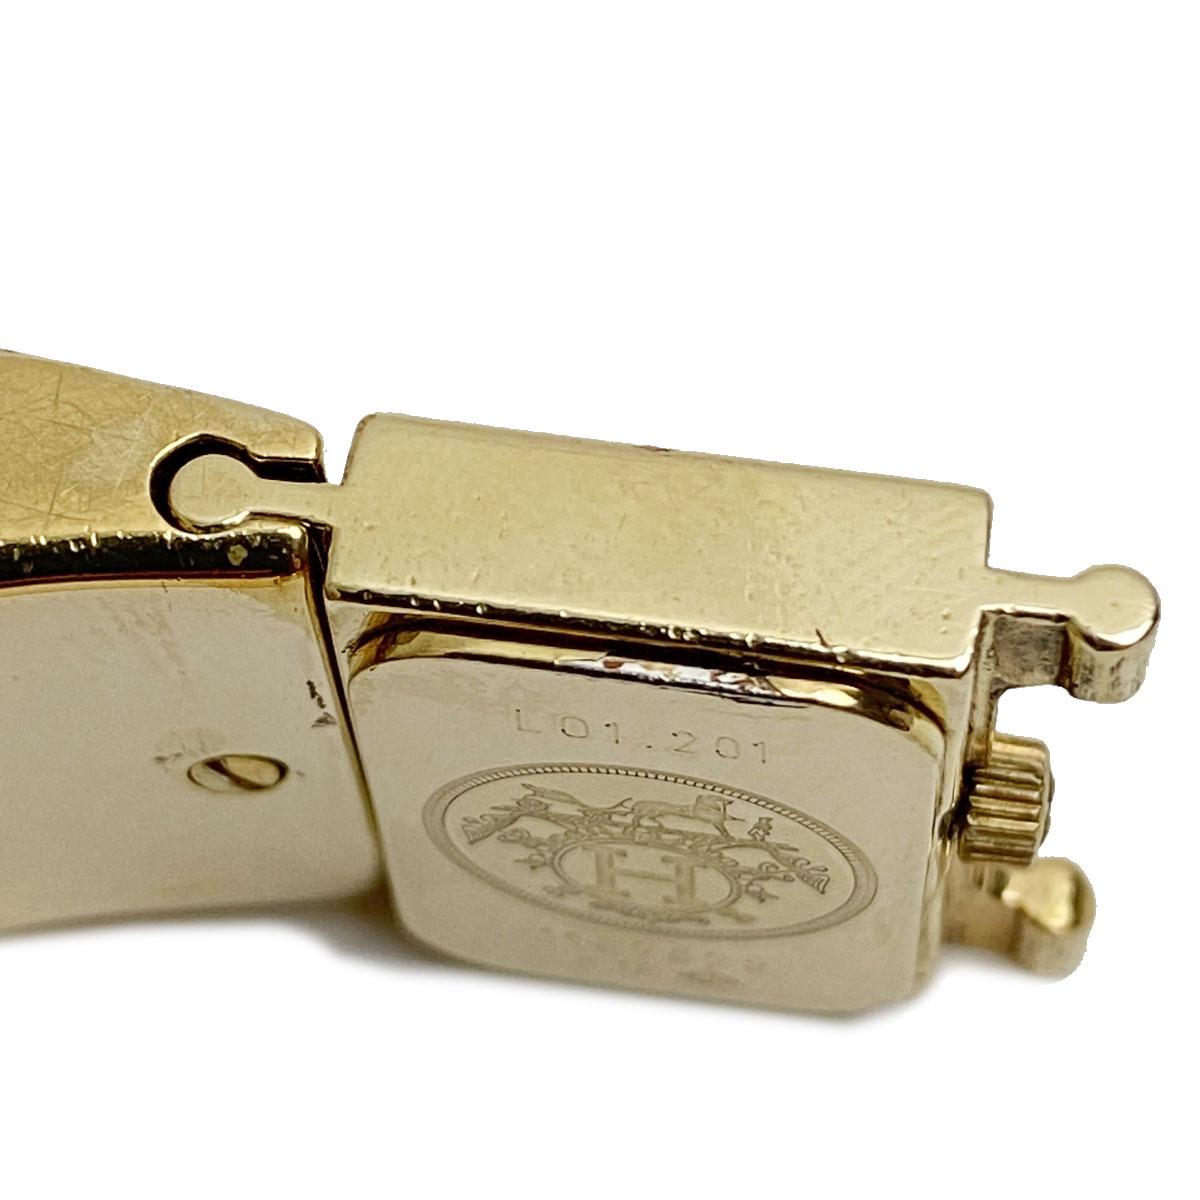 HERMES エルメス ロケ レディース腕時計 バングルウォッチ ウッド クォーツ LO1.201.470/2WA